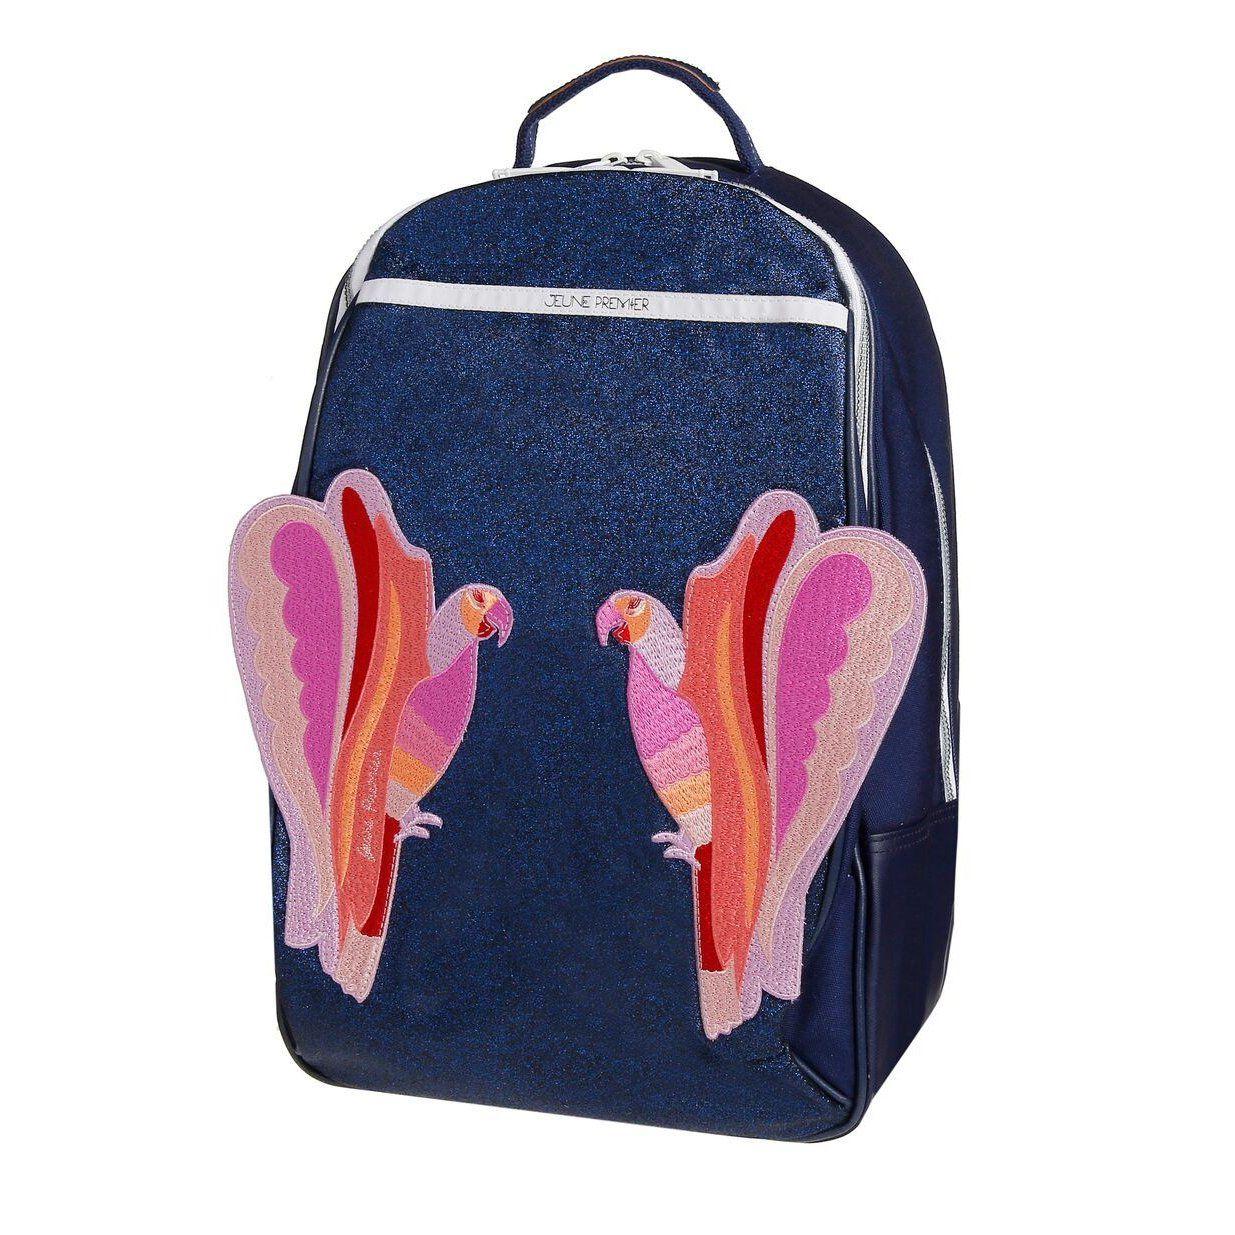 4d495bdd84f Love Bird Backpack in 2019 | bag | Backpacks, Love birds, School bags